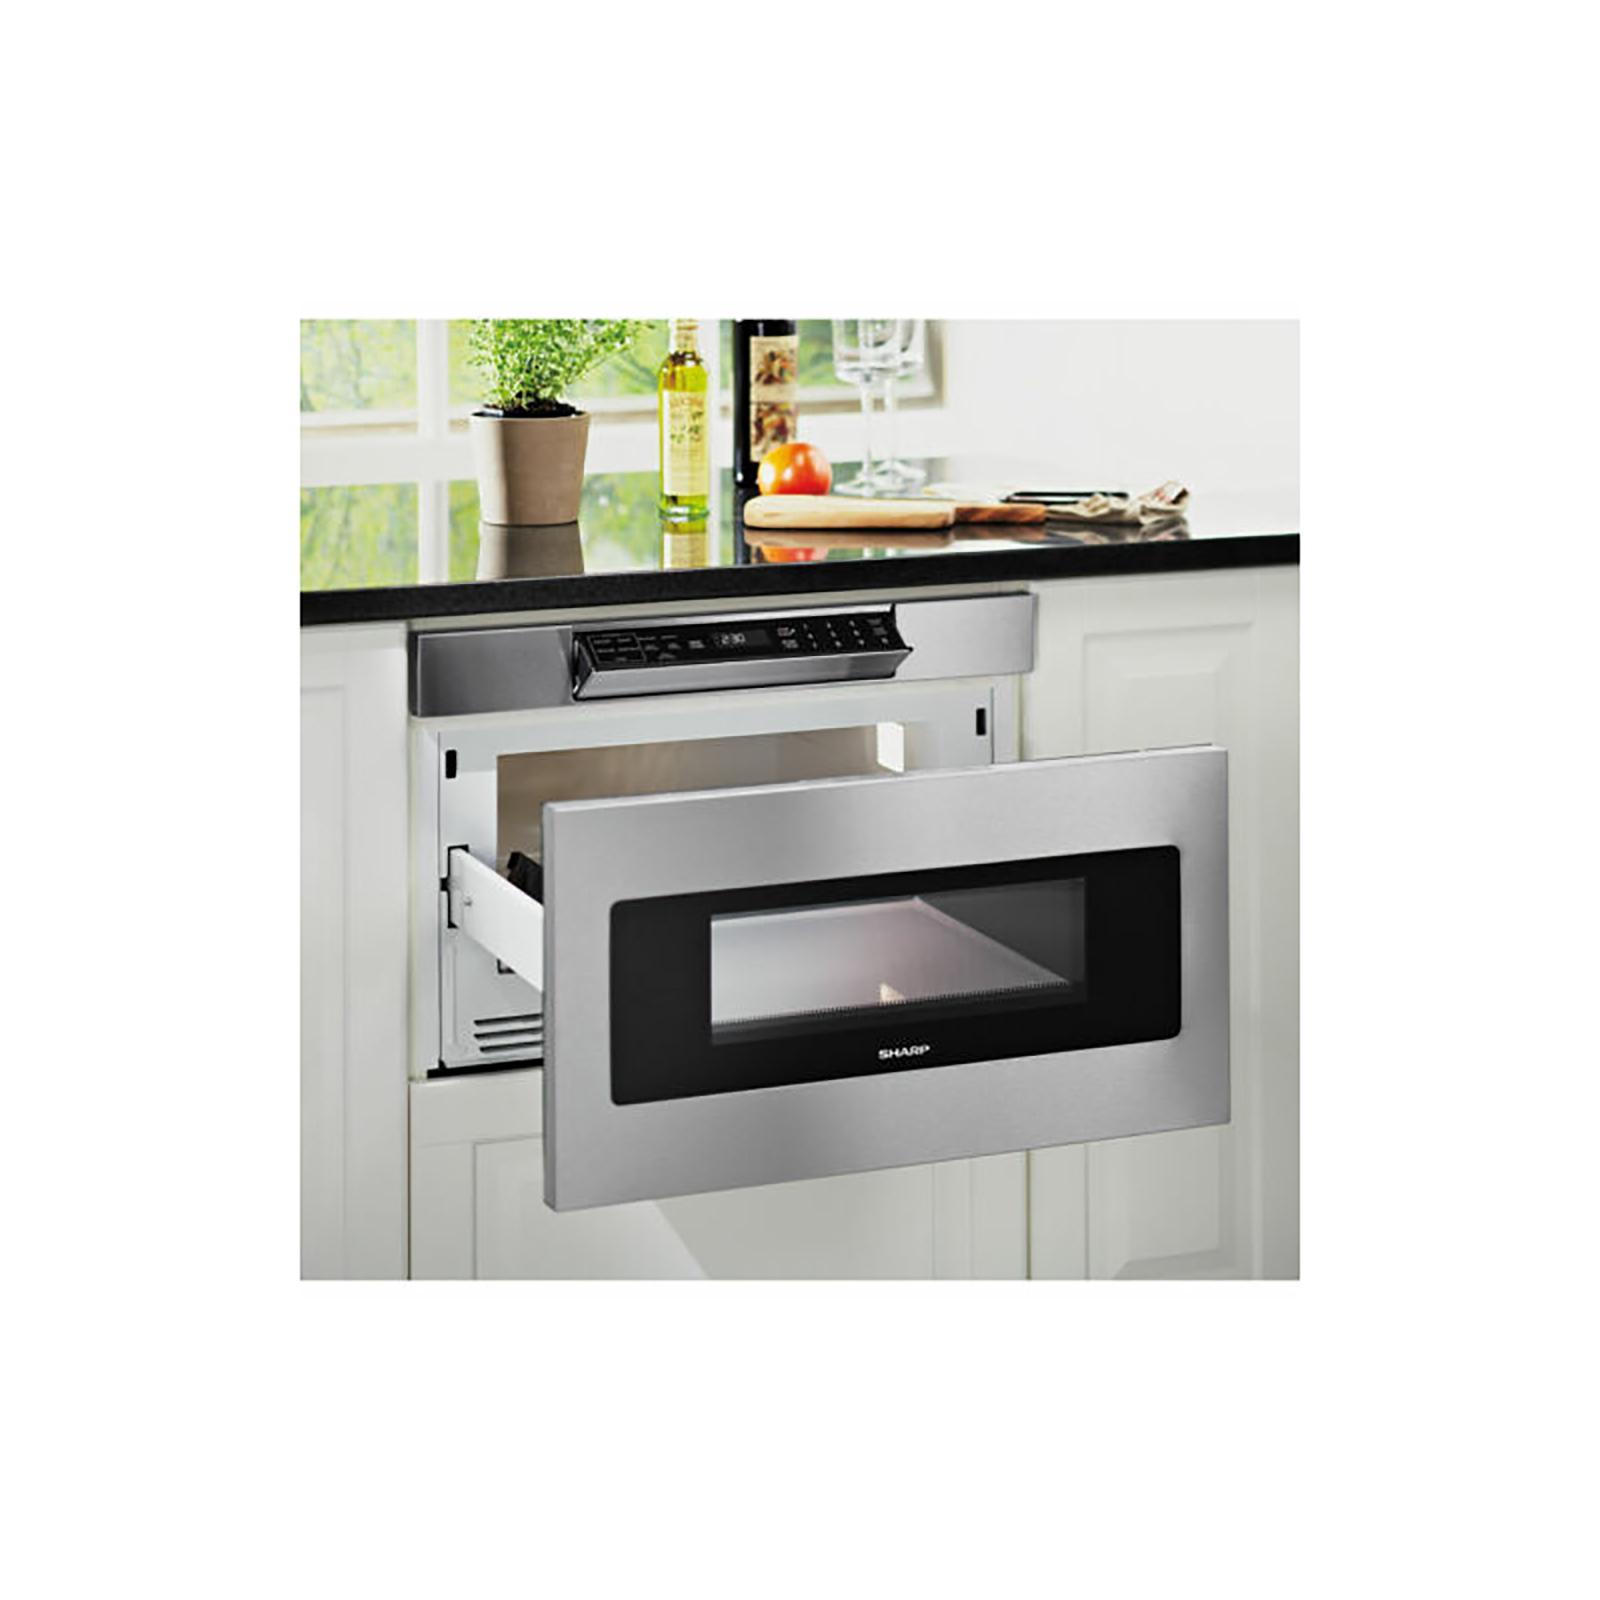 sharp 24 stainless steel microwave